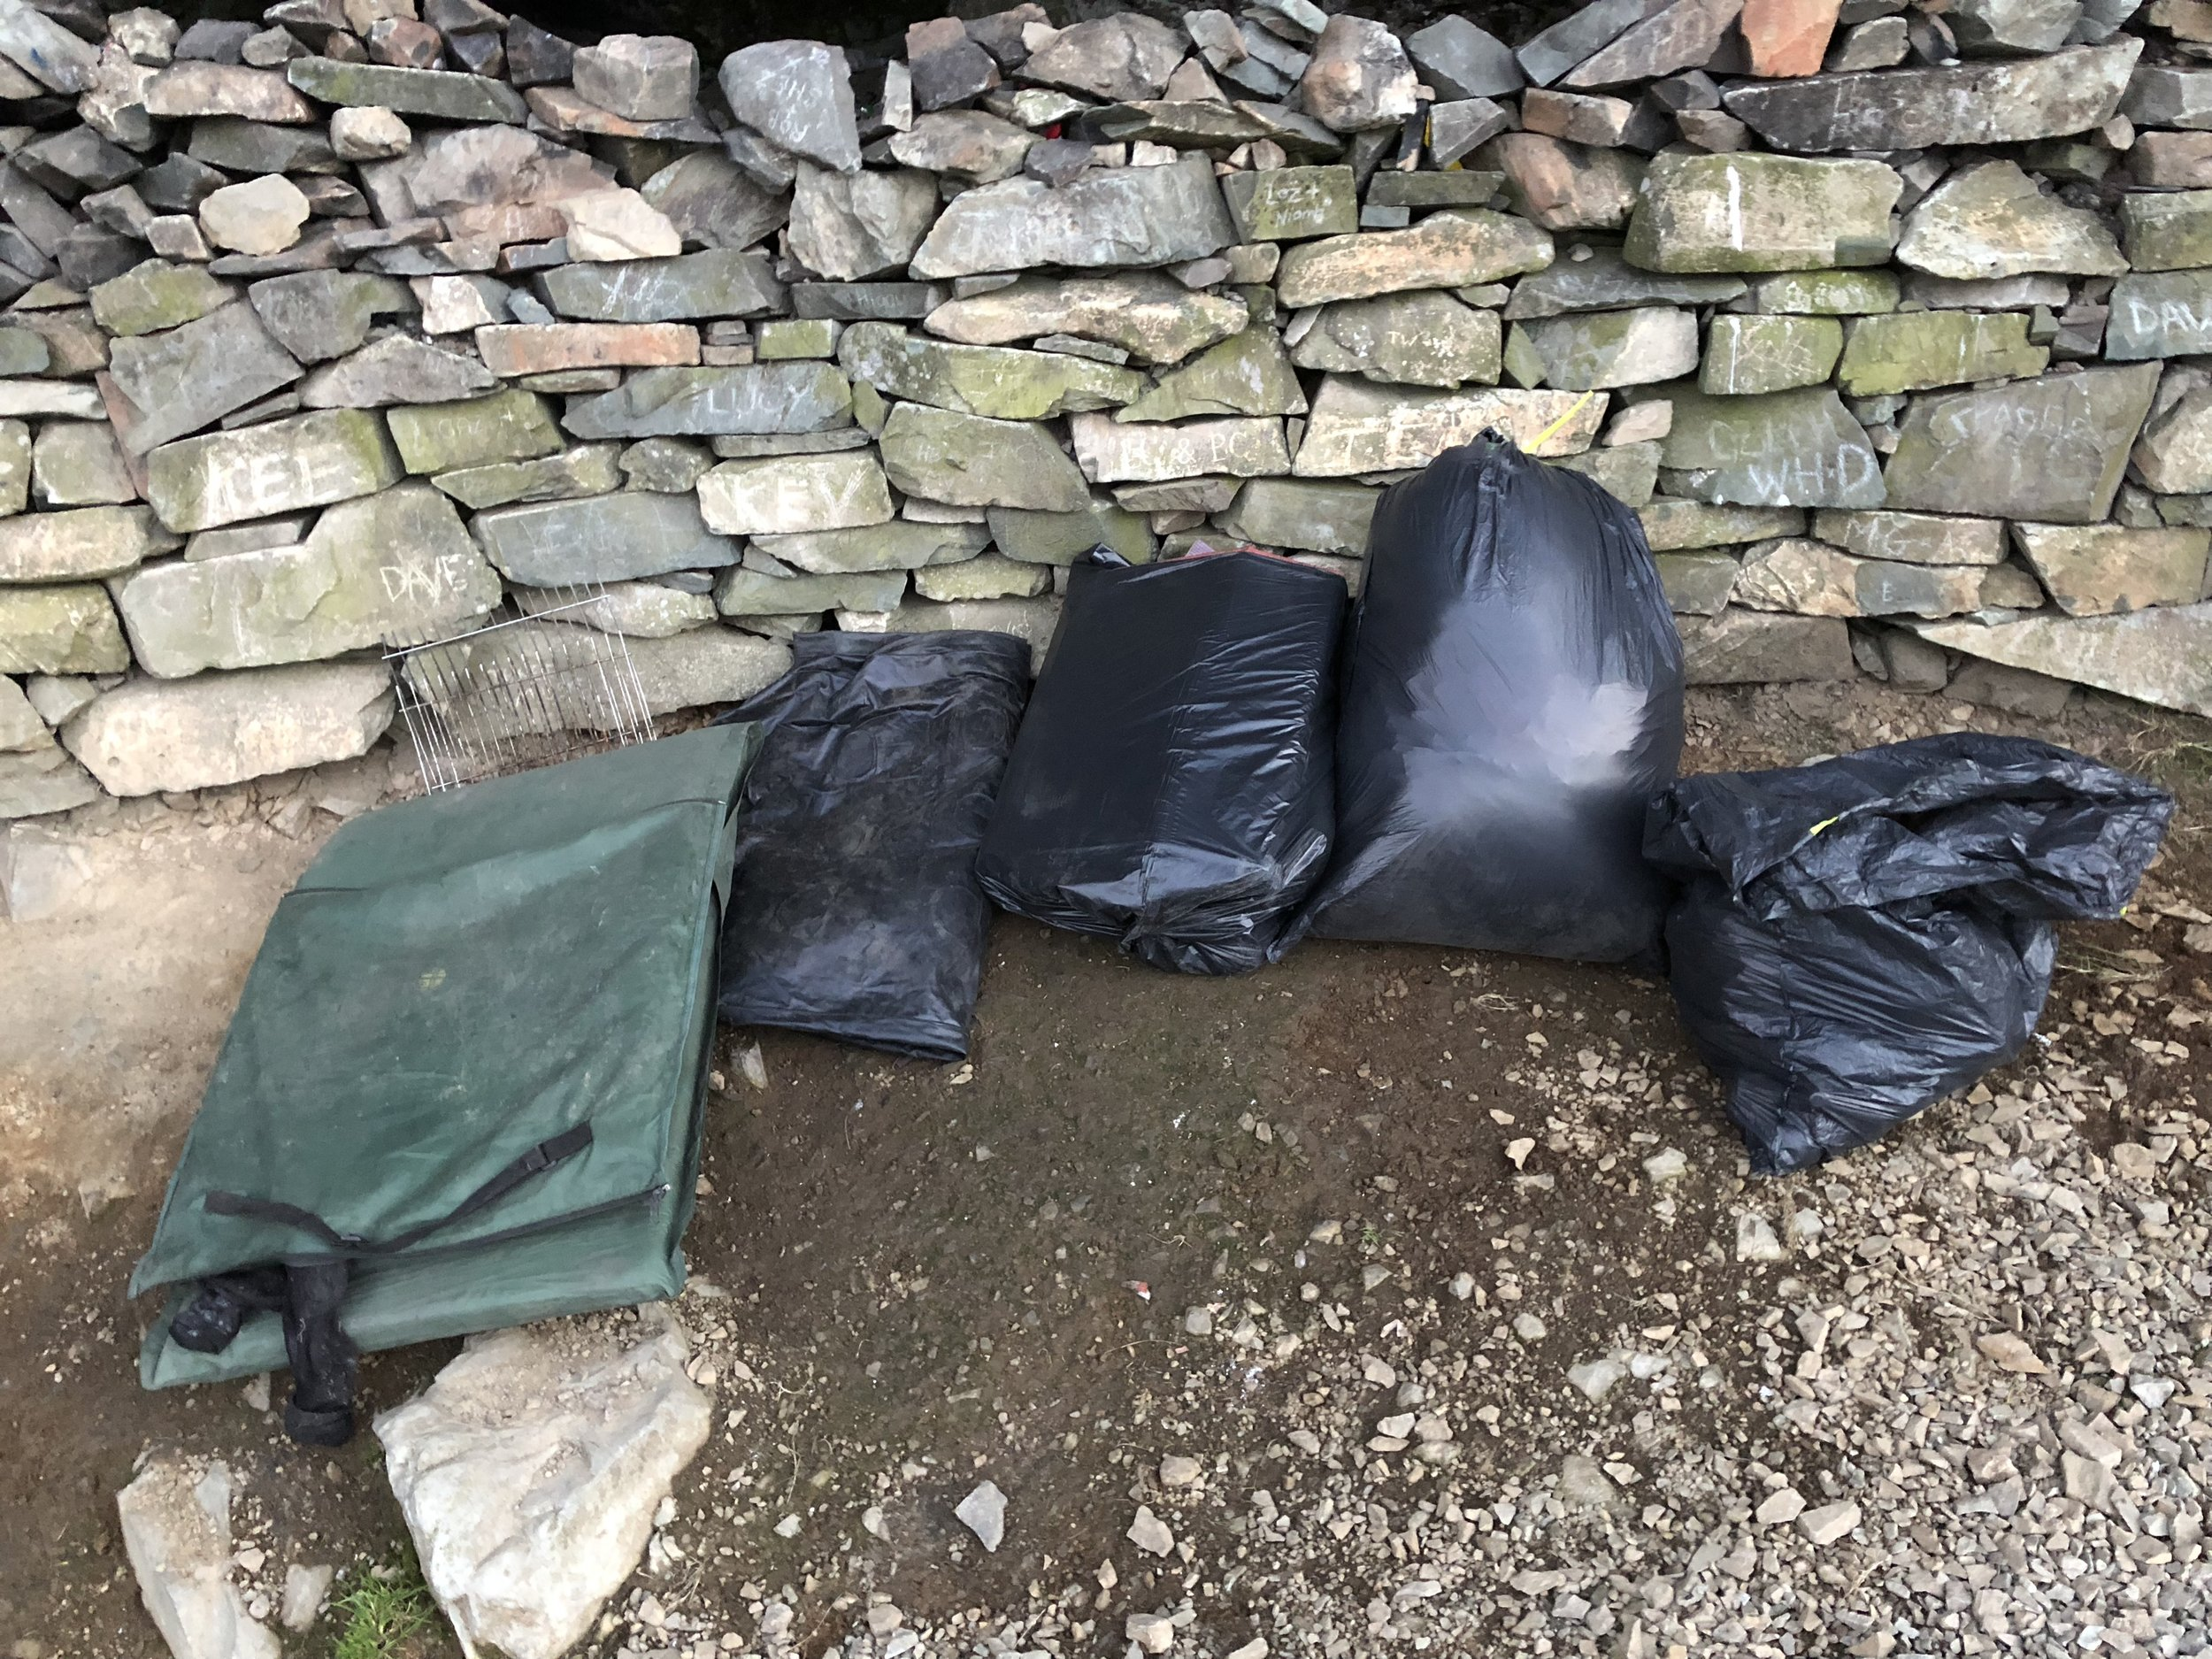 priest-hole-cave-litter-clean-litter-peaks-daniel-toal